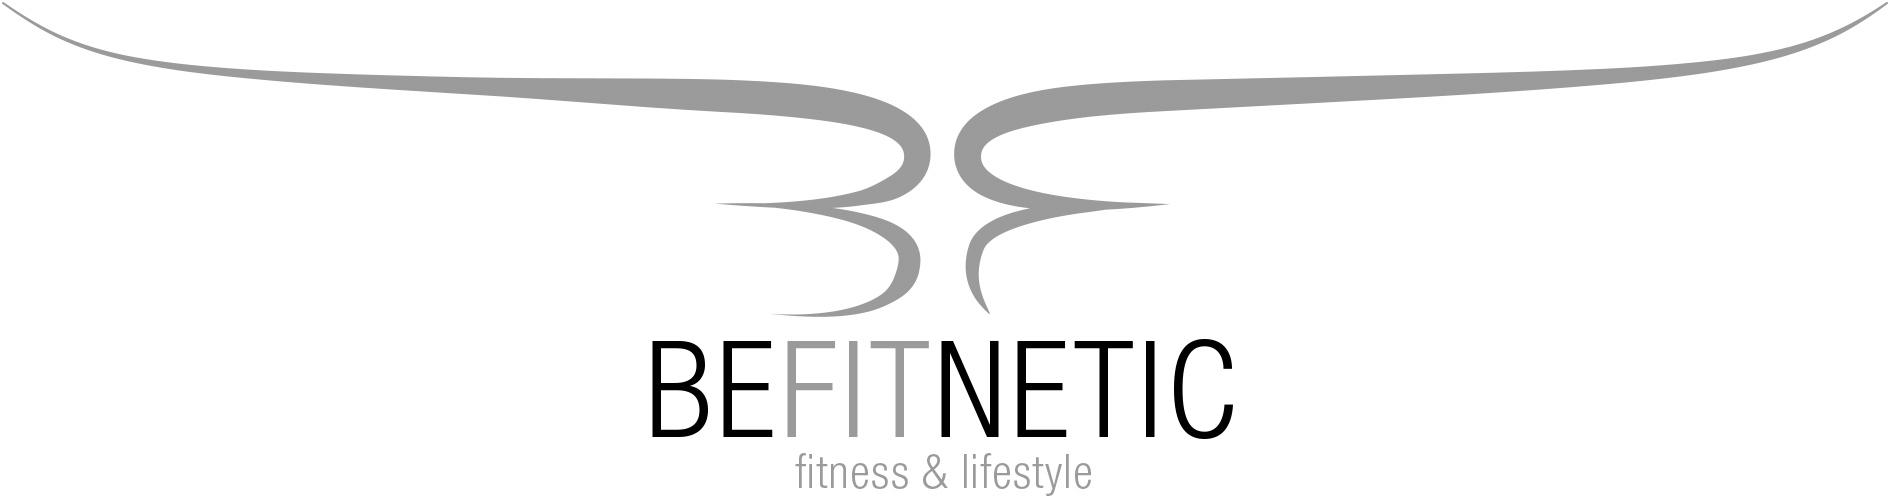 BB BEFITNETIC fitness & lifestyle